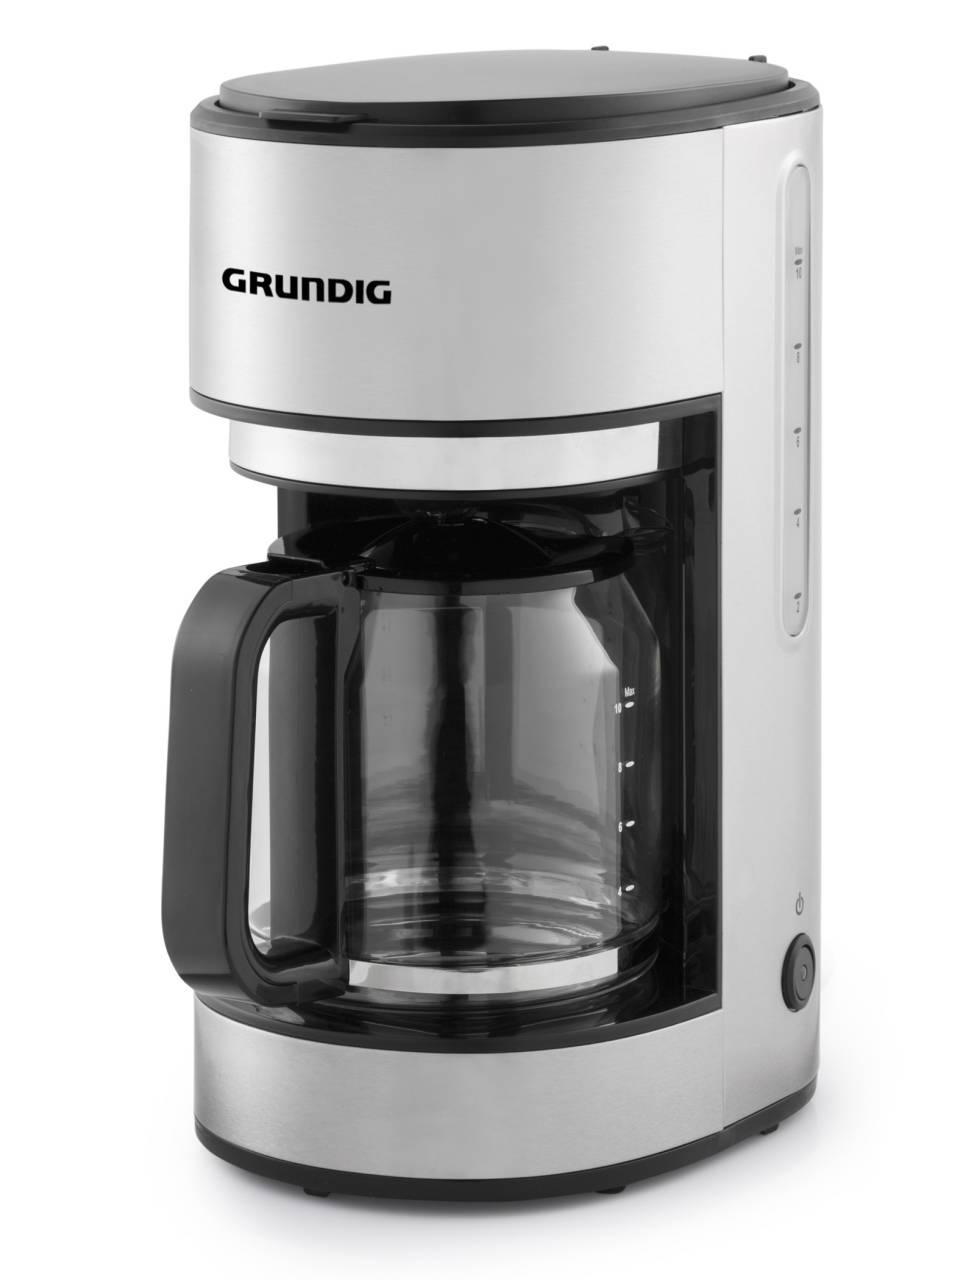 Grundig Kaffeemaschine KM 5620 mit Edelstahlkorpus.